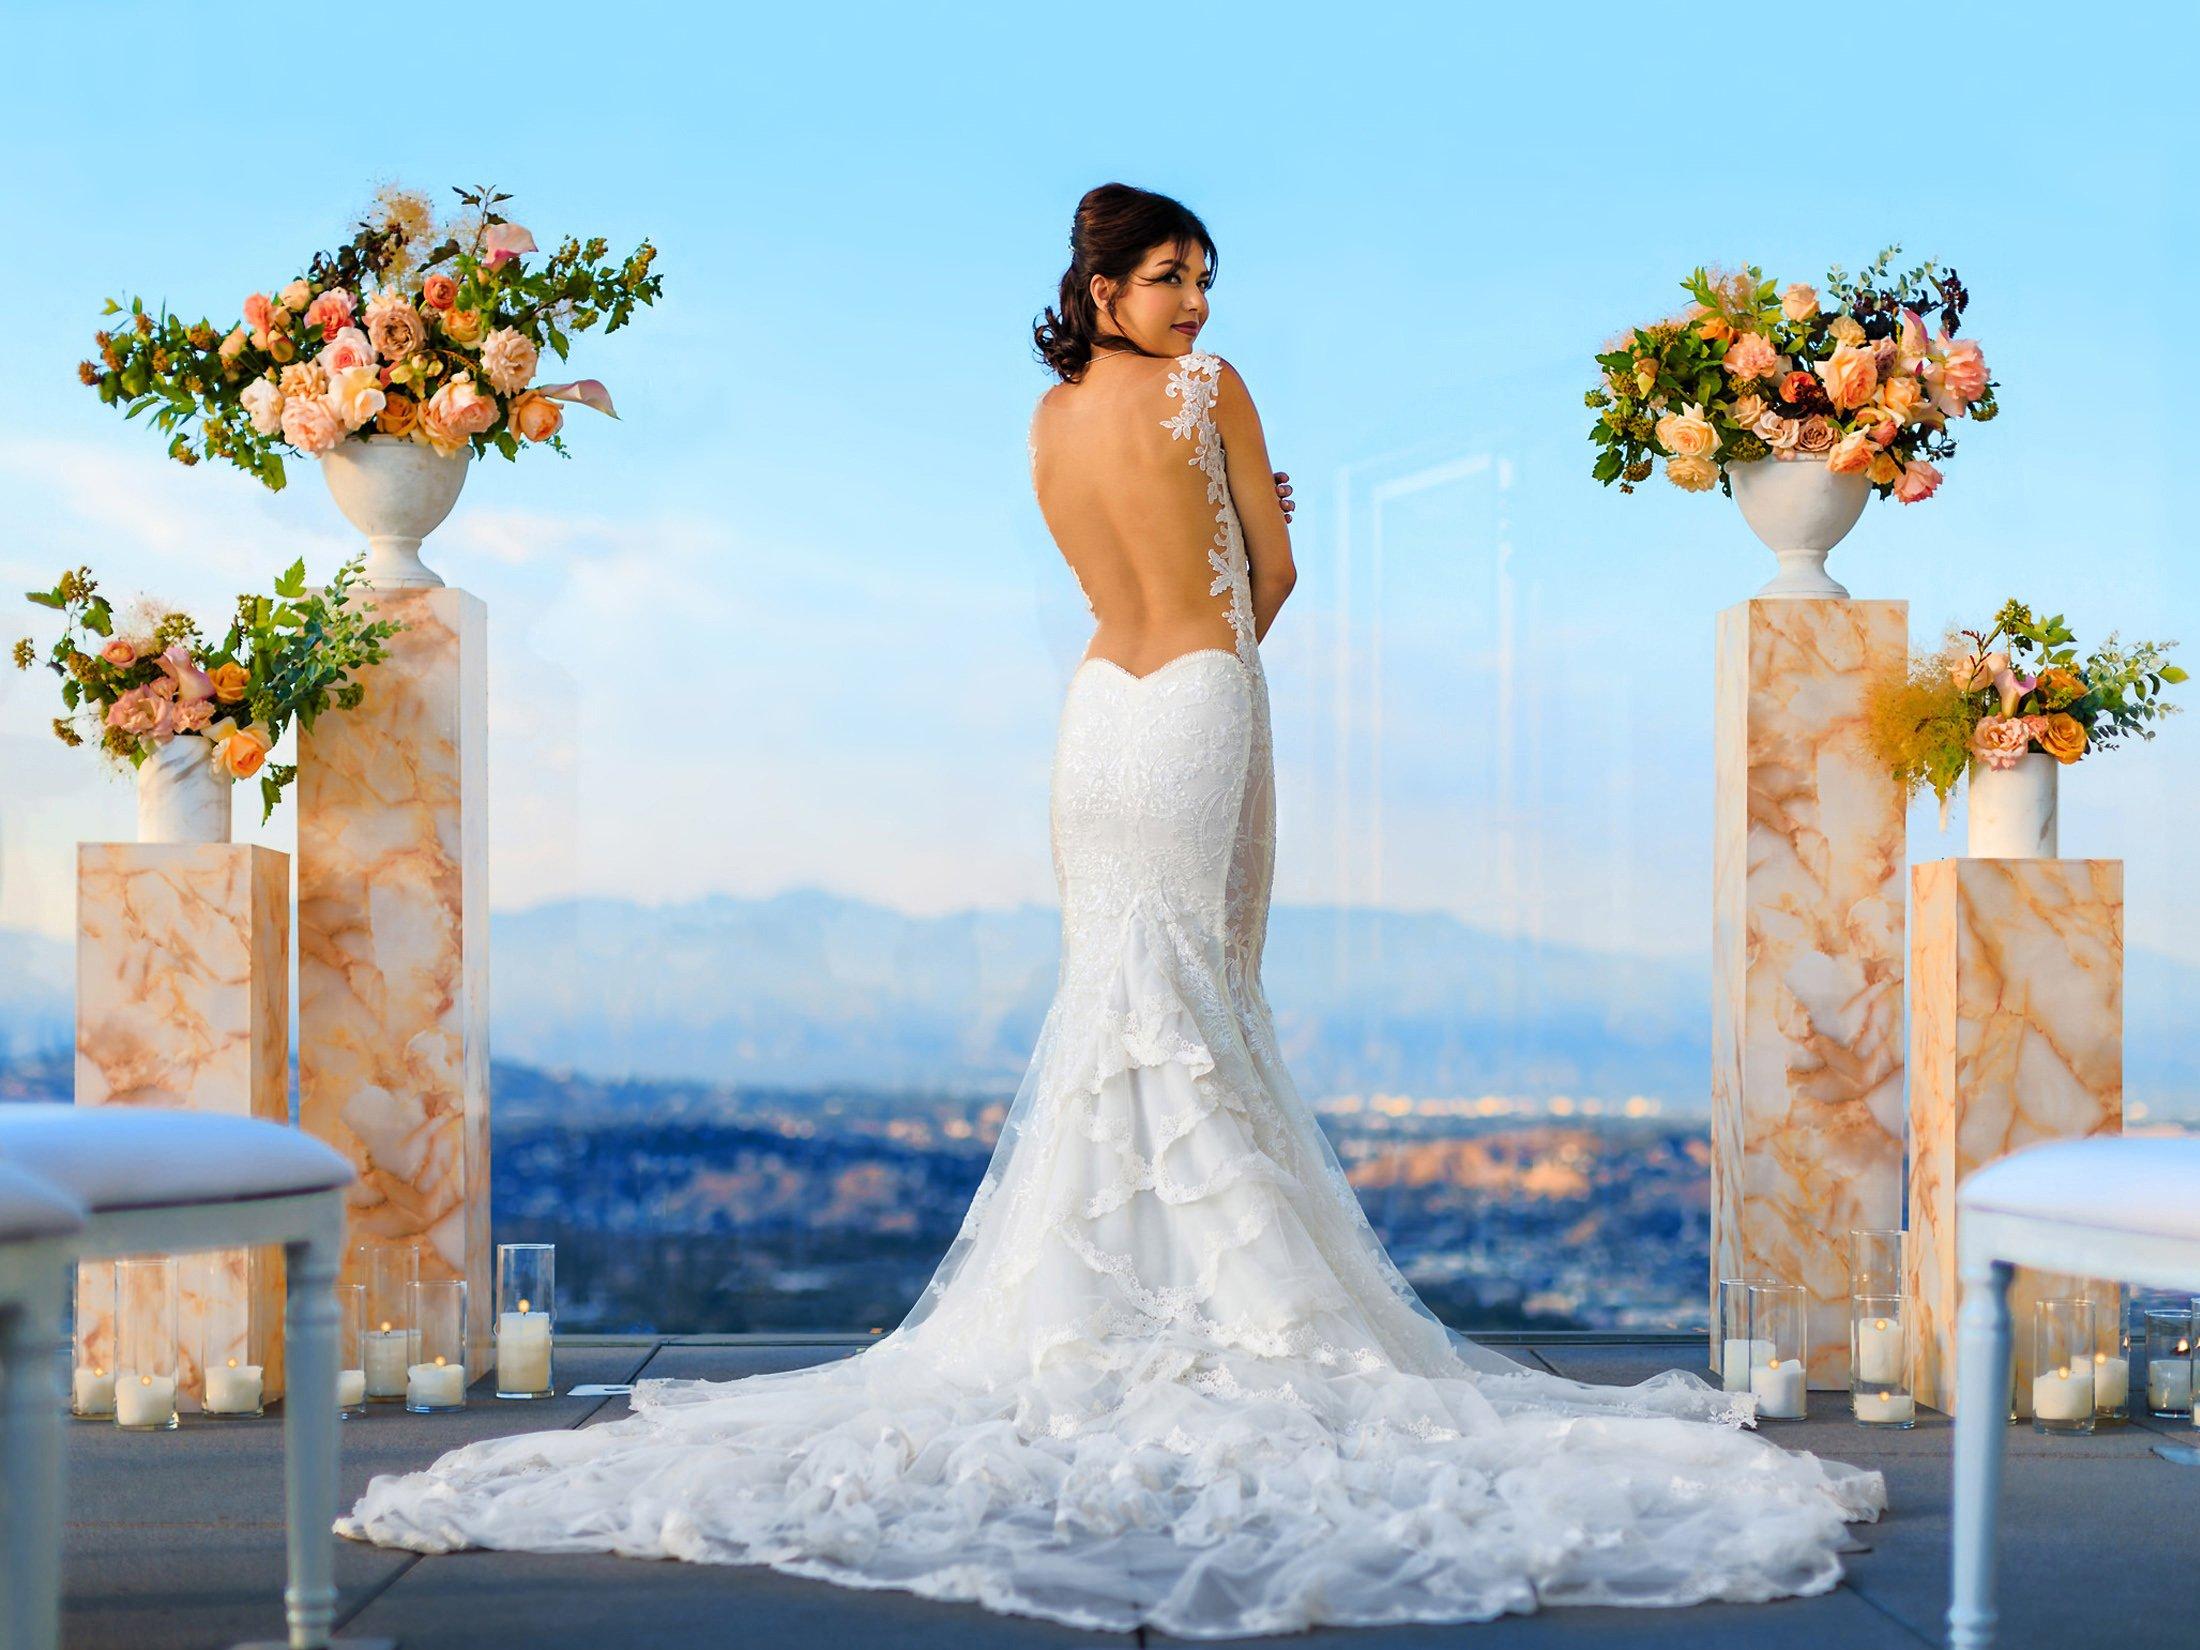 Best Garment district wedding dresses in Los Angeles, CA - Yelp 66